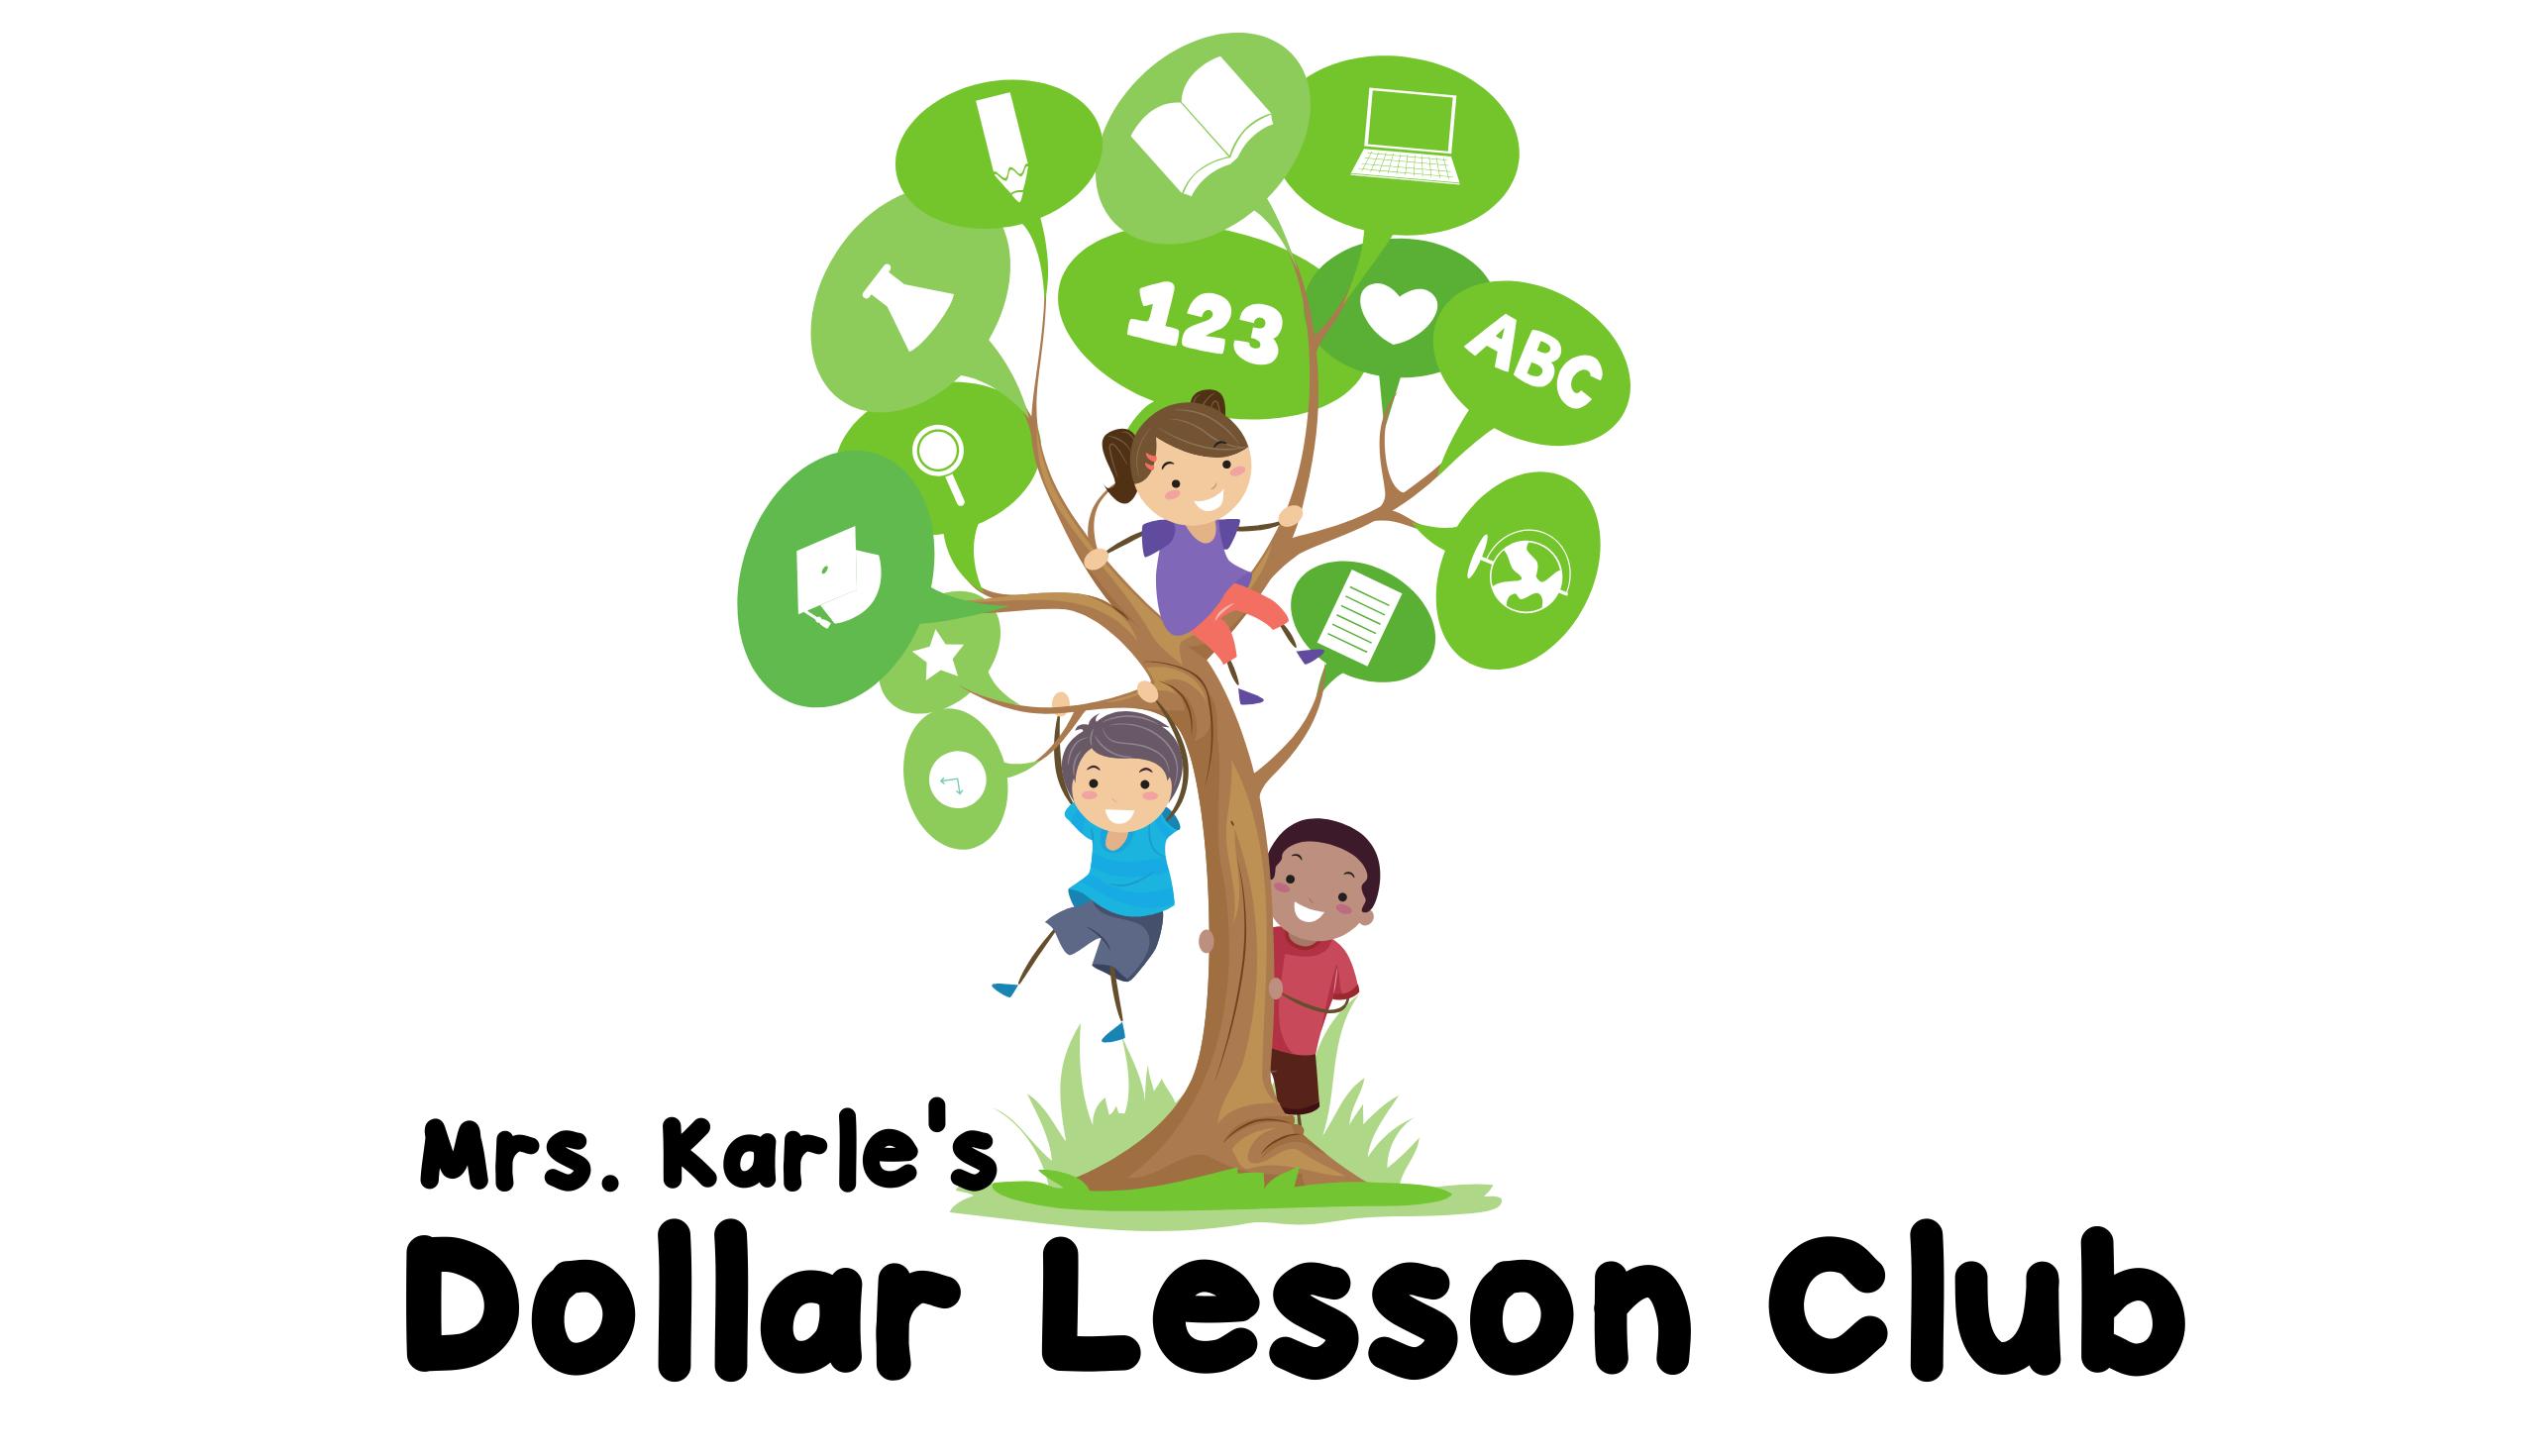 dollarlessonclub.com